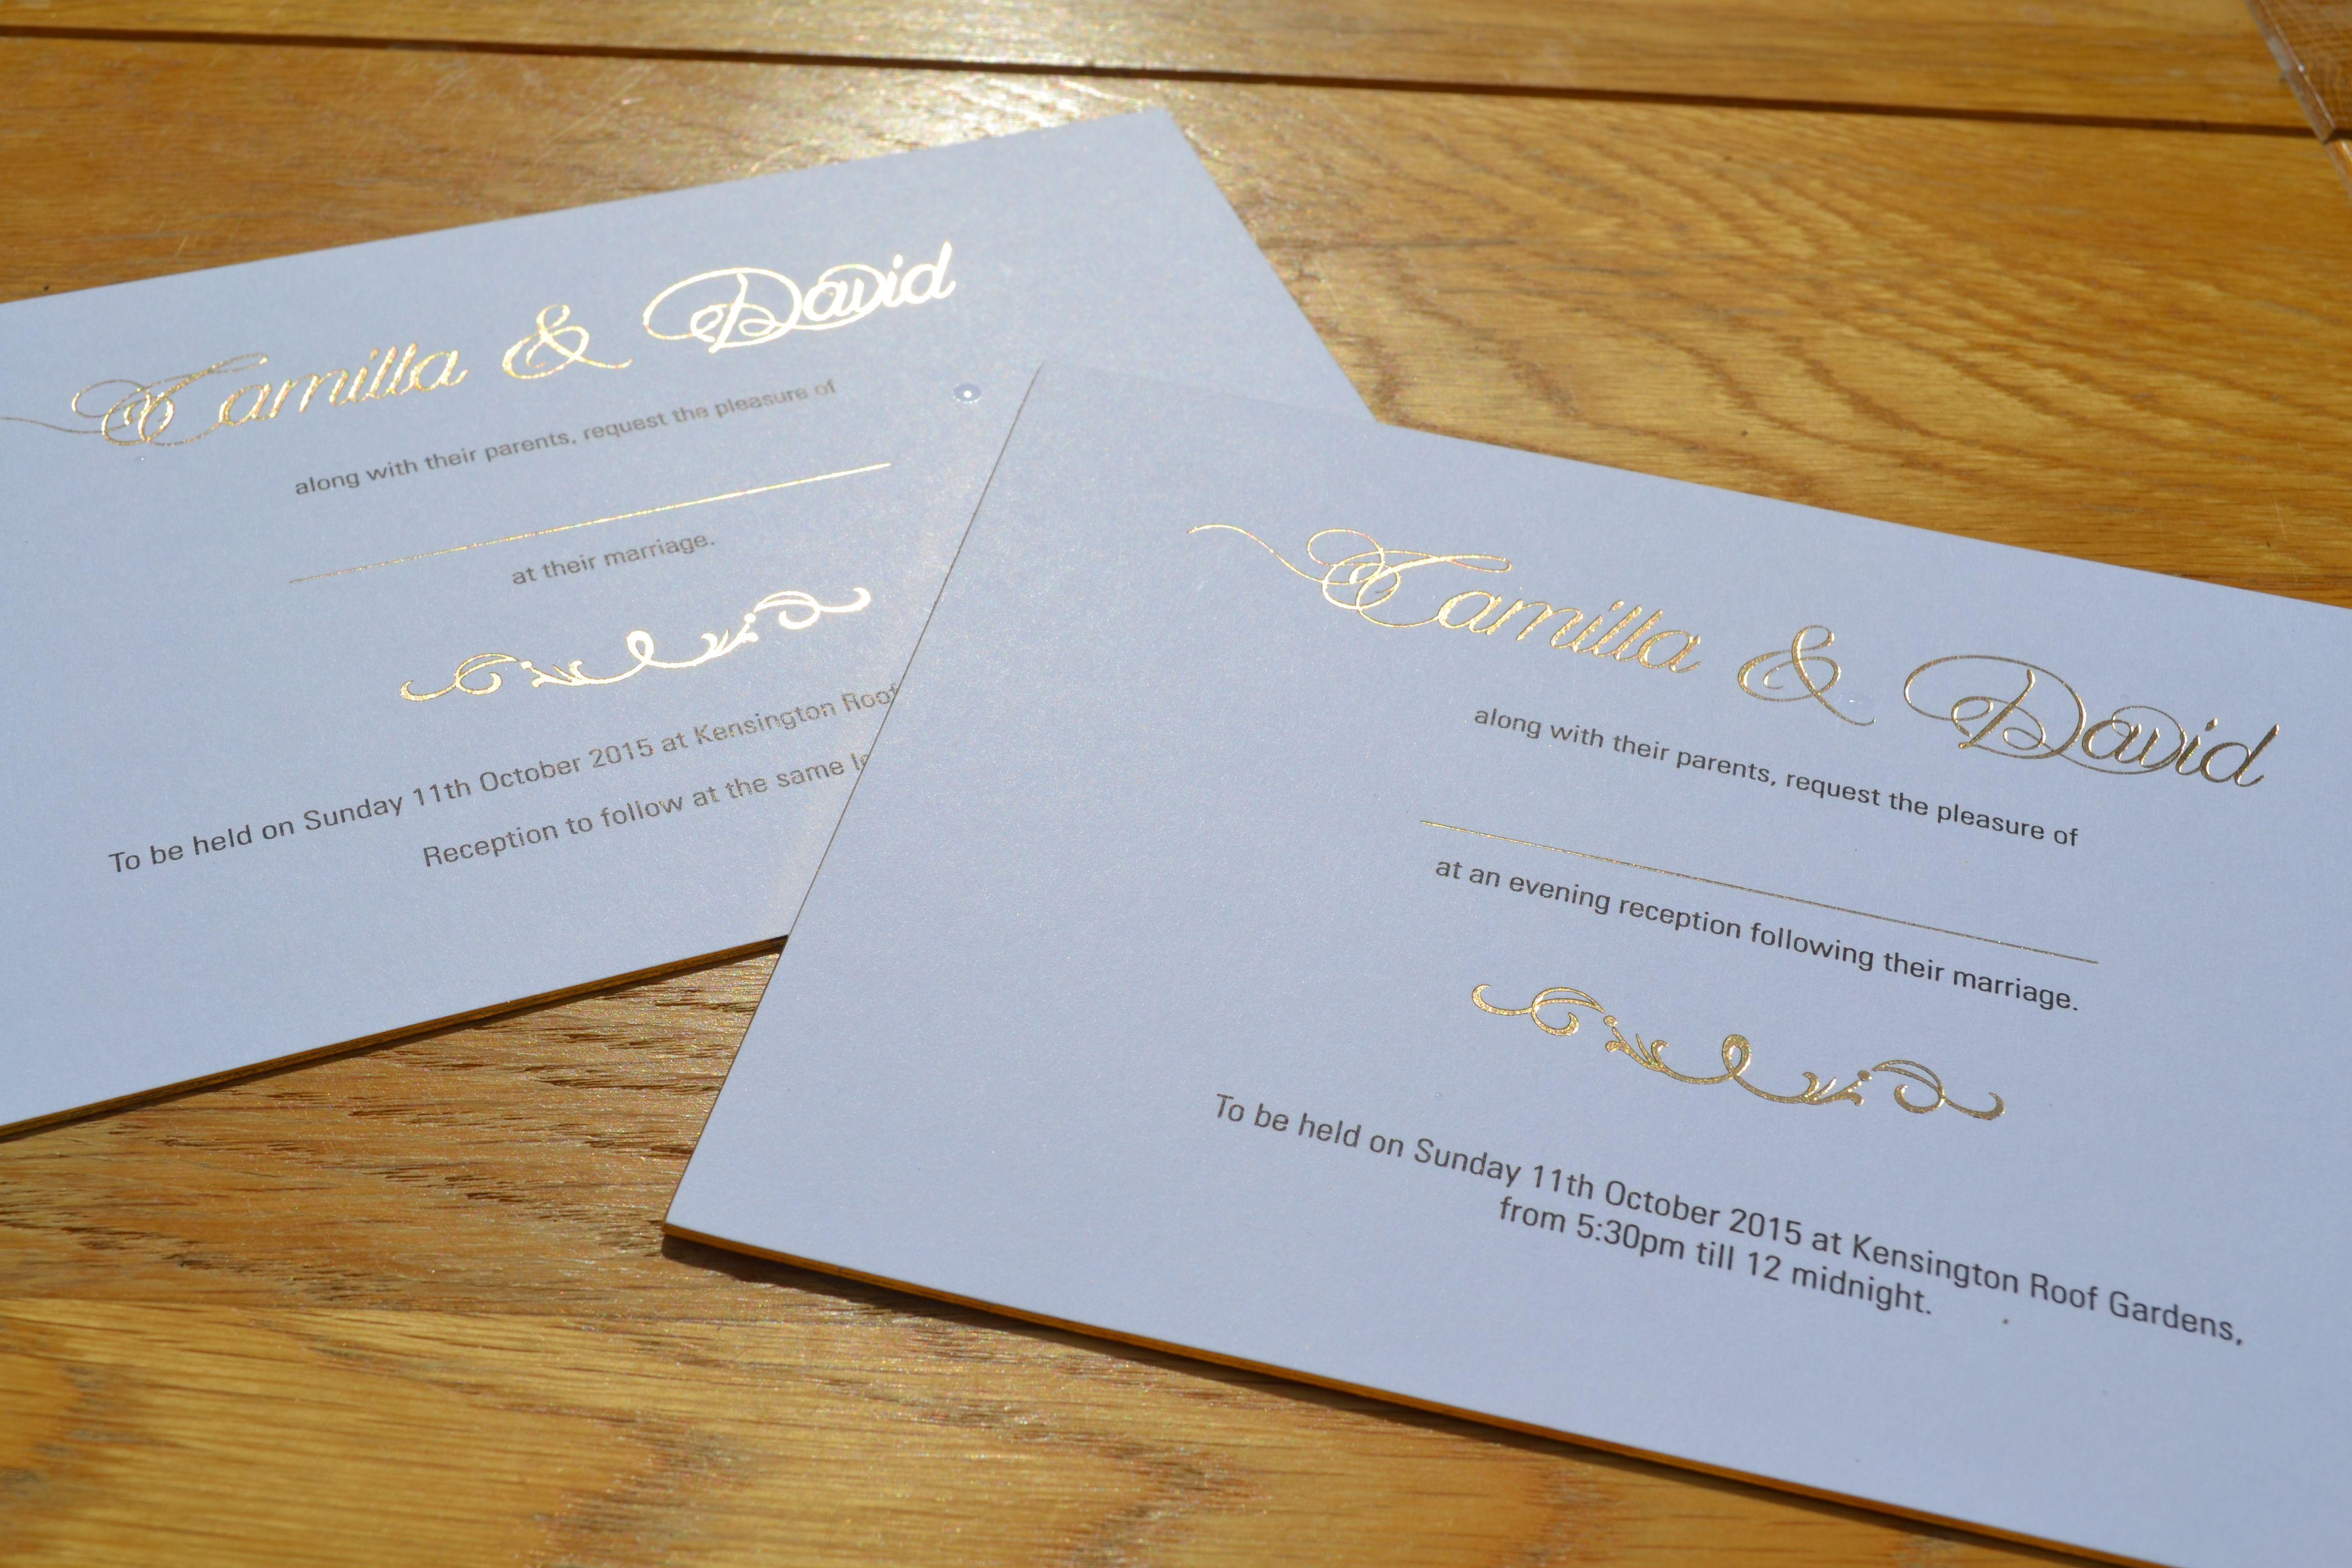 wedding invitations printing Wedding invitations printed in gold foil black litho flat print on gold gilt edged cards